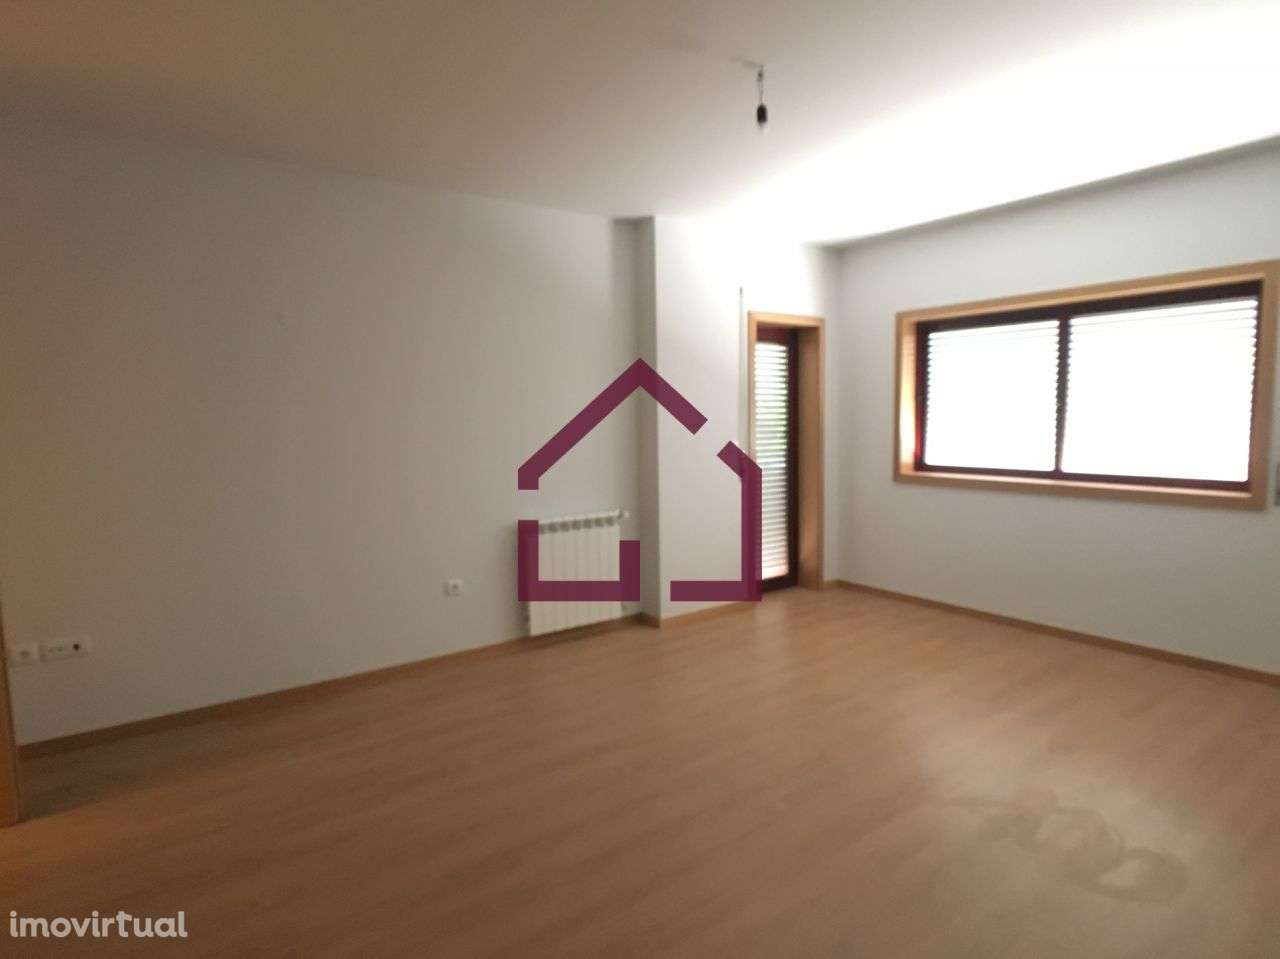 Apartamento para comprar, Oliveira de Azeméis, Santiago de Riba-Ul, Ul, Macinhata da Seixa e Madail, Aveiro - Foto 10